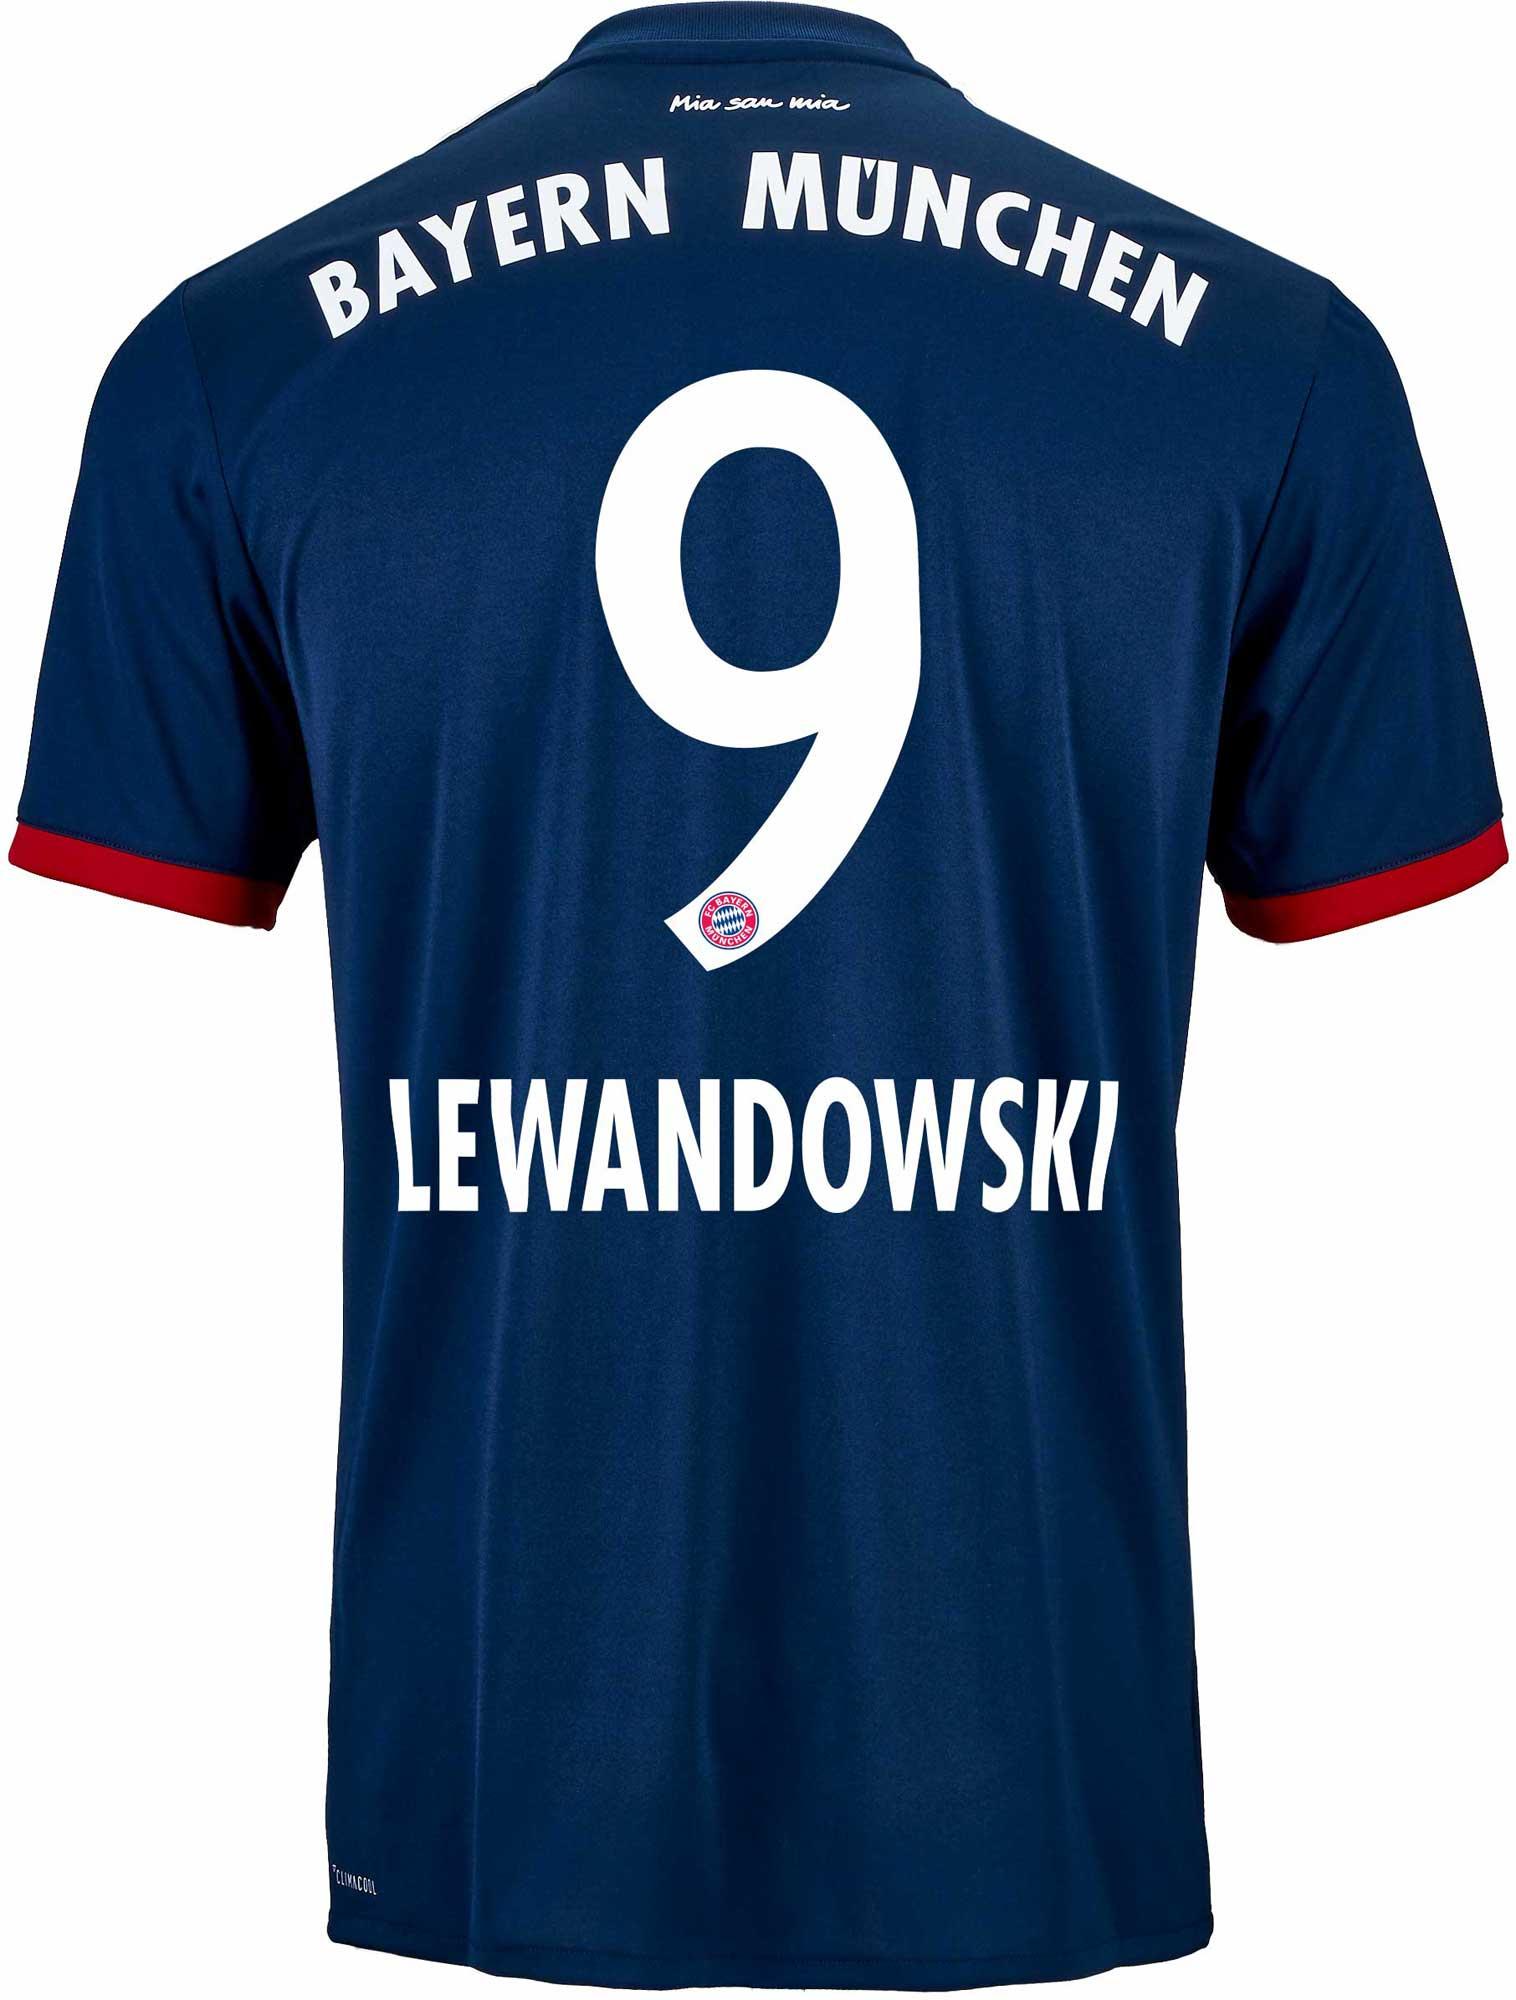 2017/18 adidas Kids Robert Lewandowski Bayern Munich Away ...